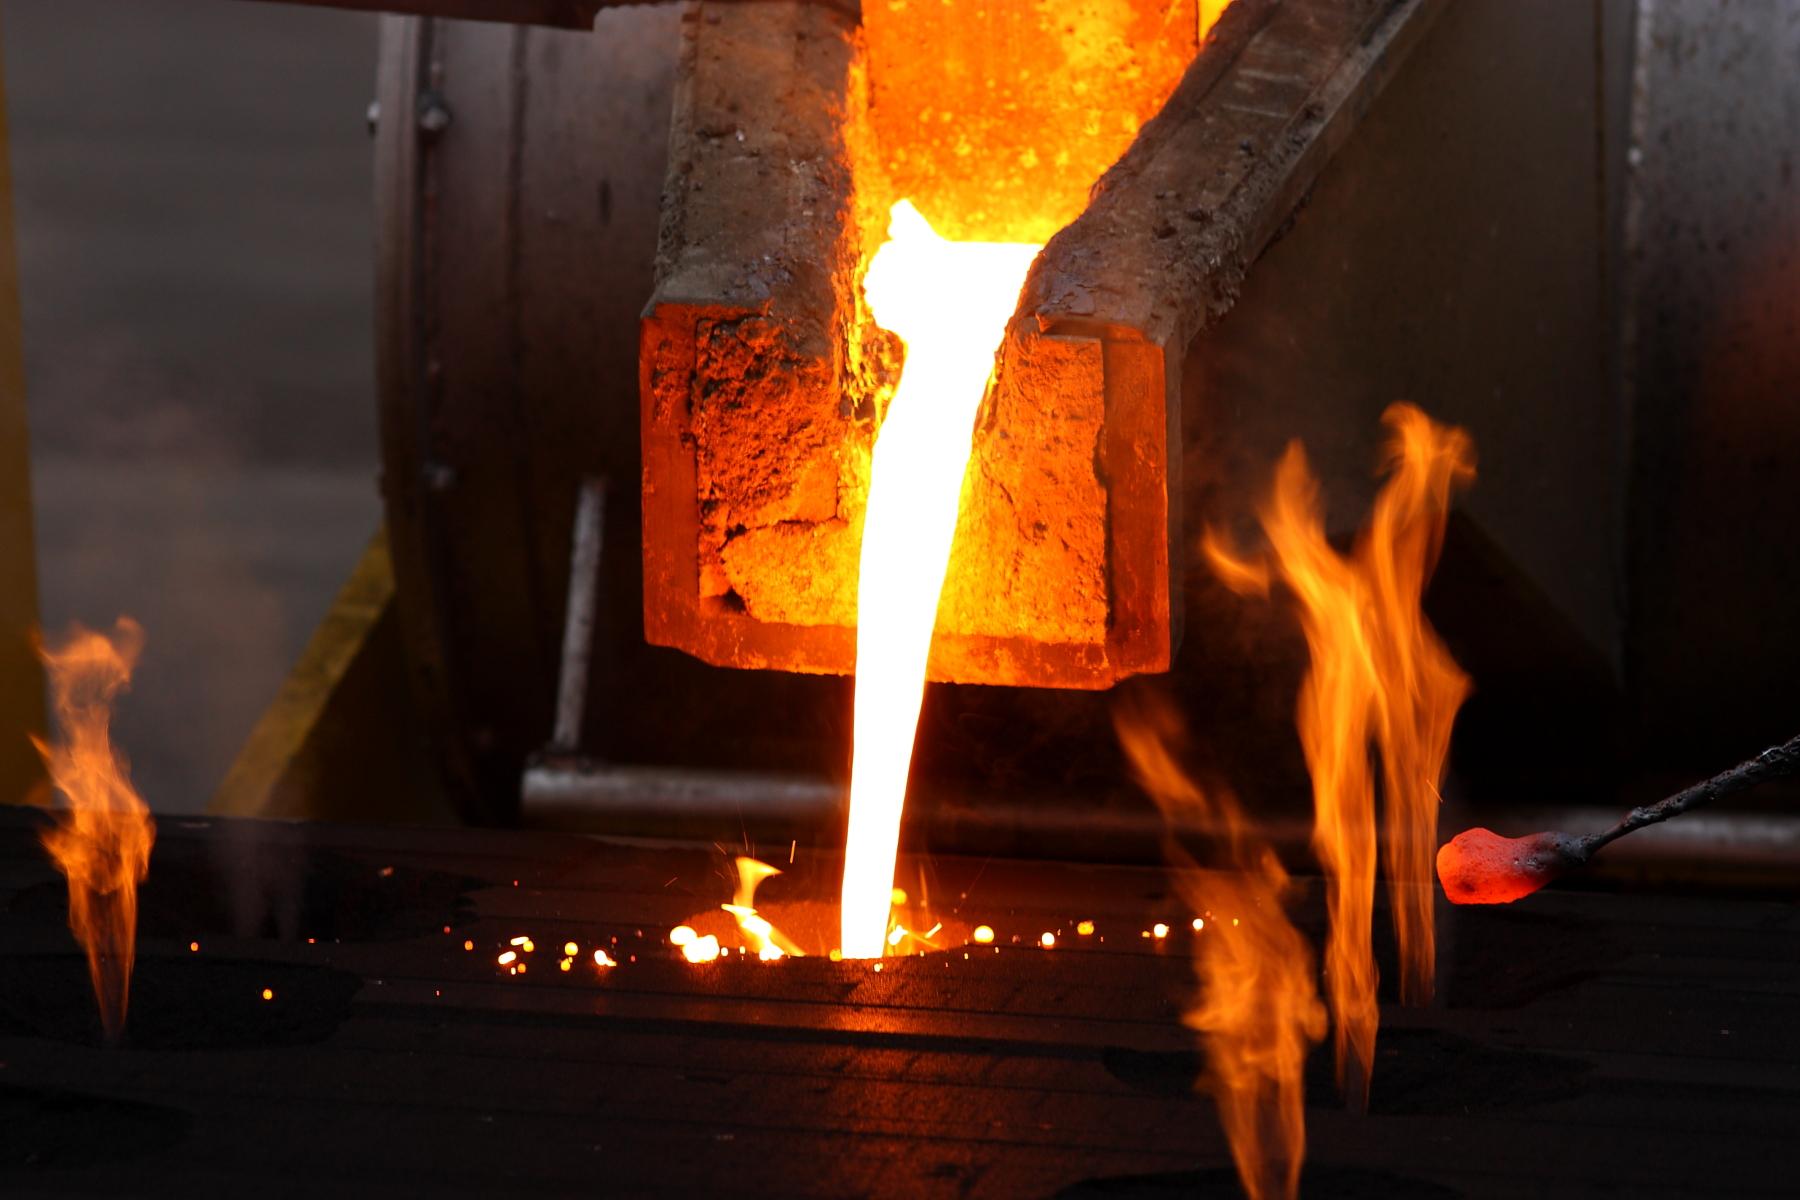 Anglo Gold exits SA